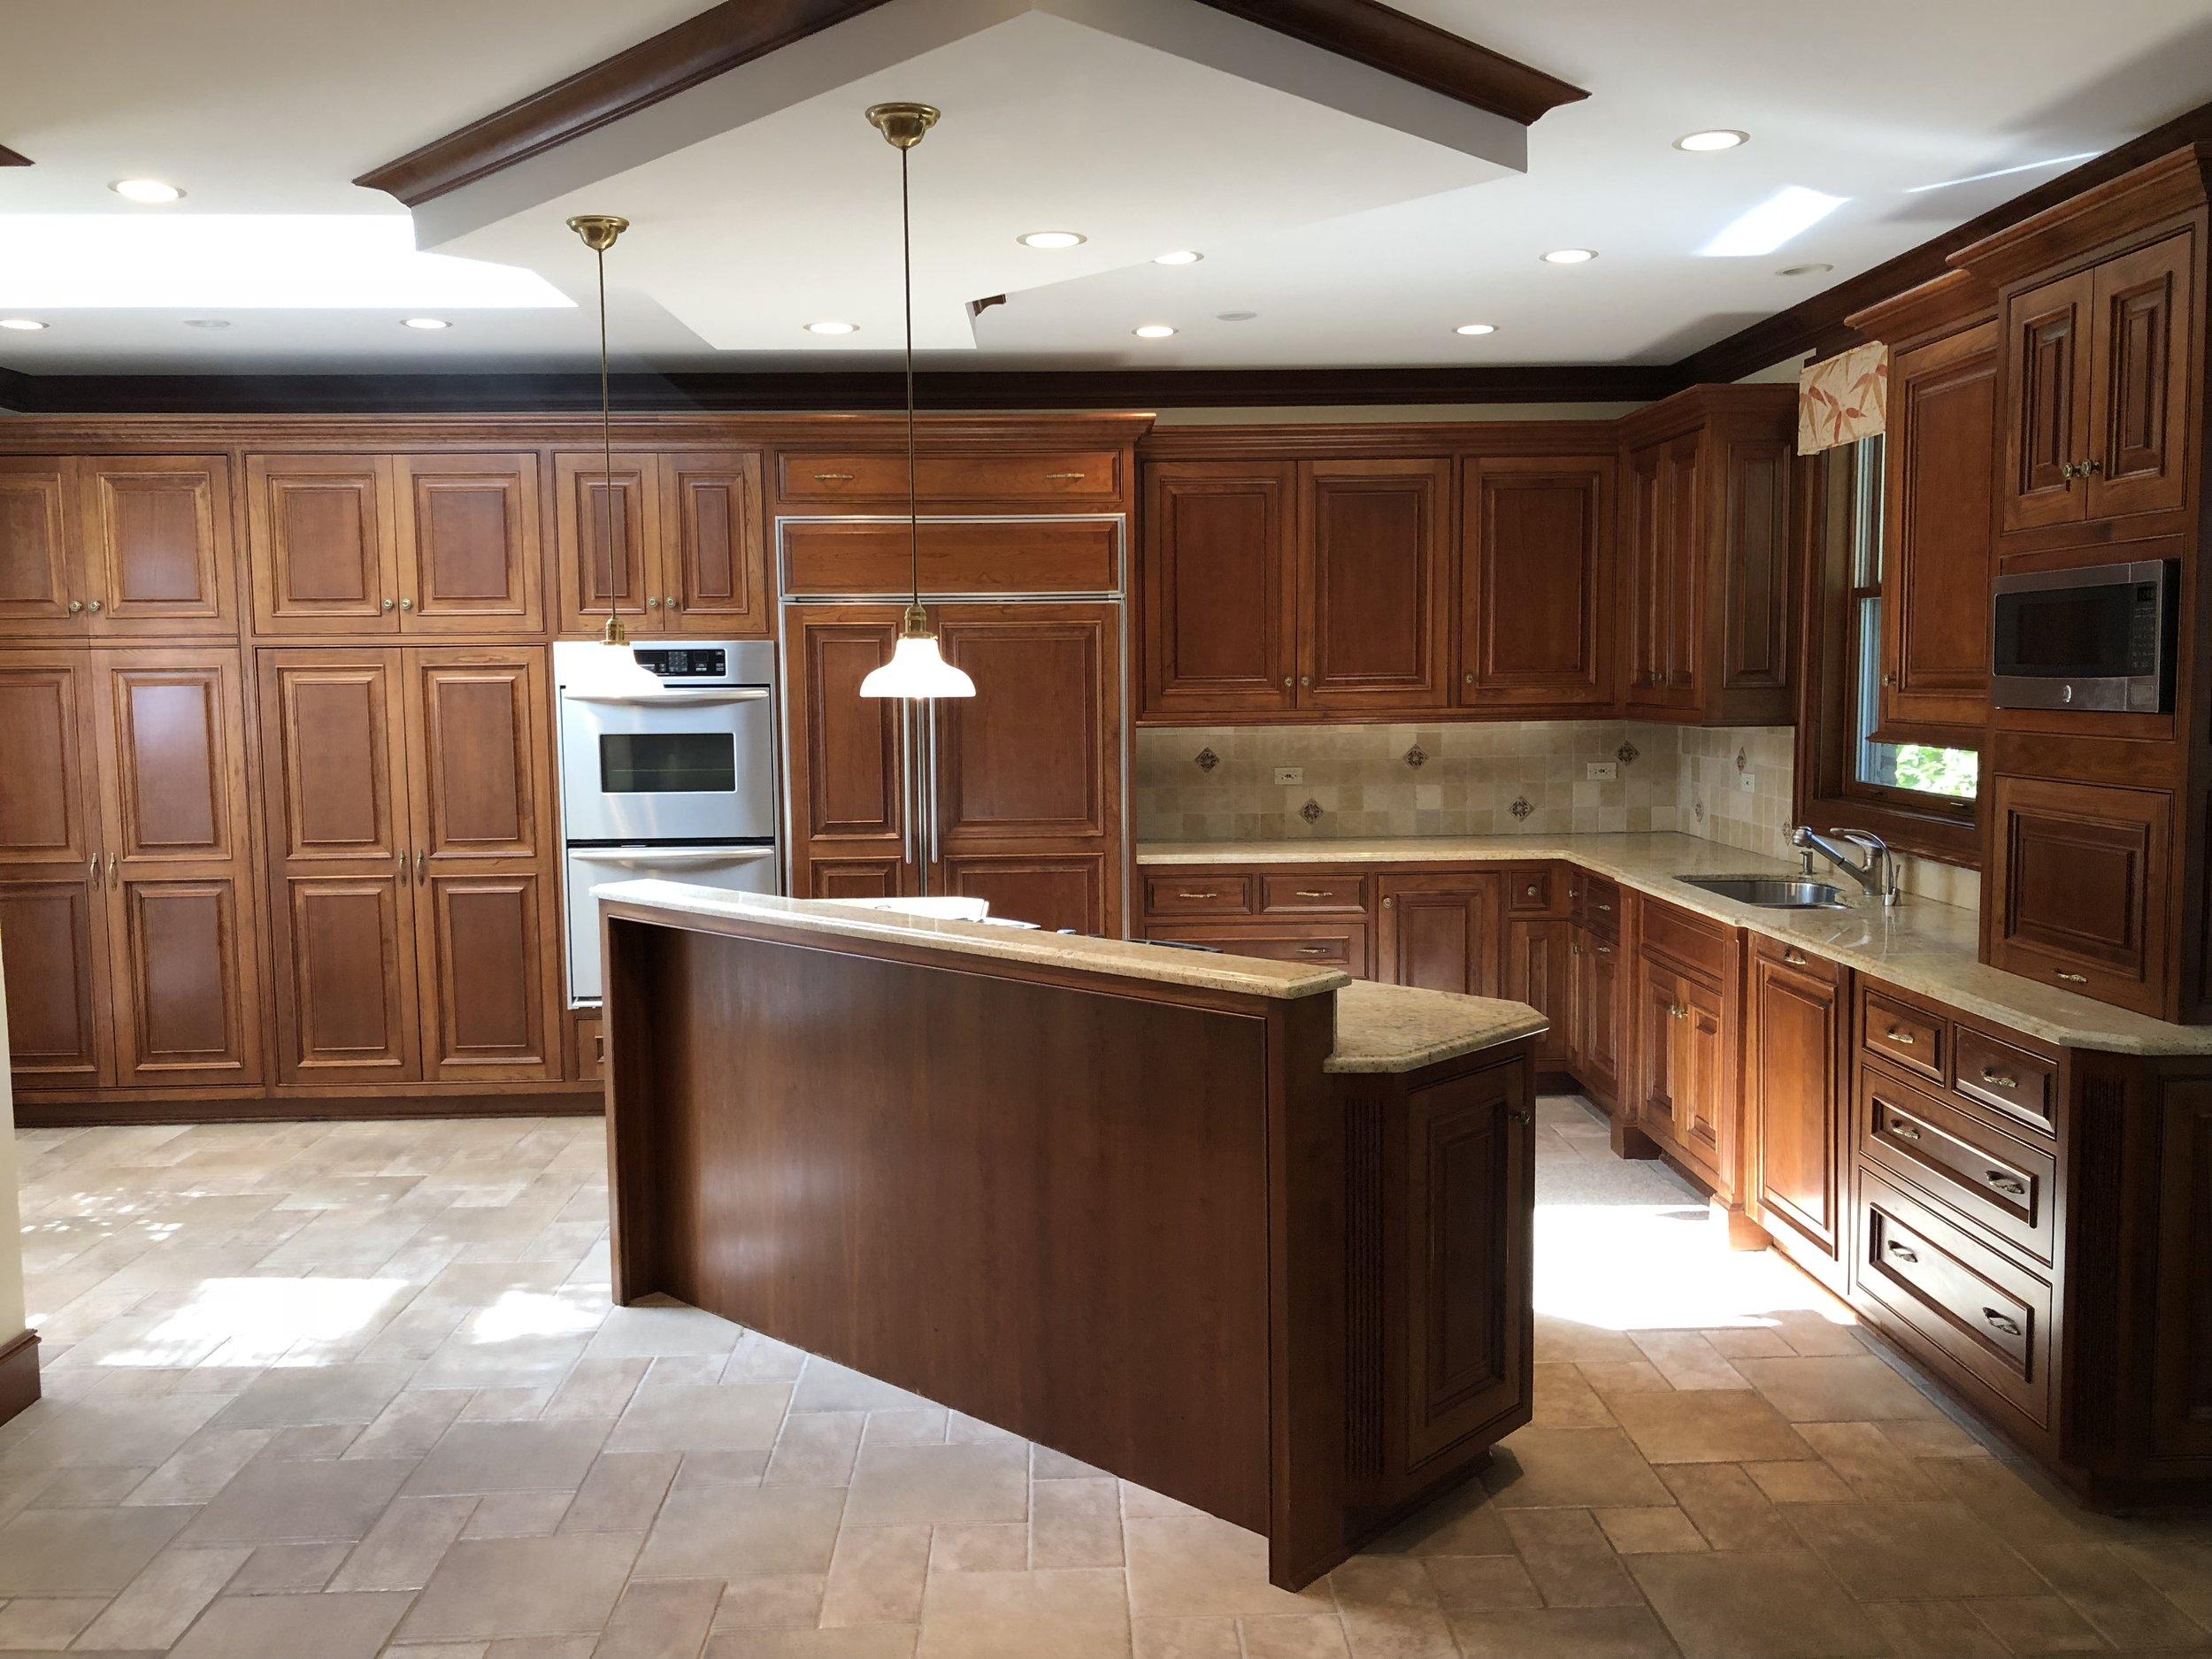 Amazing Custom Wood Complete Kitchen Cabinets Granite Sub Zero Dacor  Appliances Granite Bar Desk — Little Green Kitchens